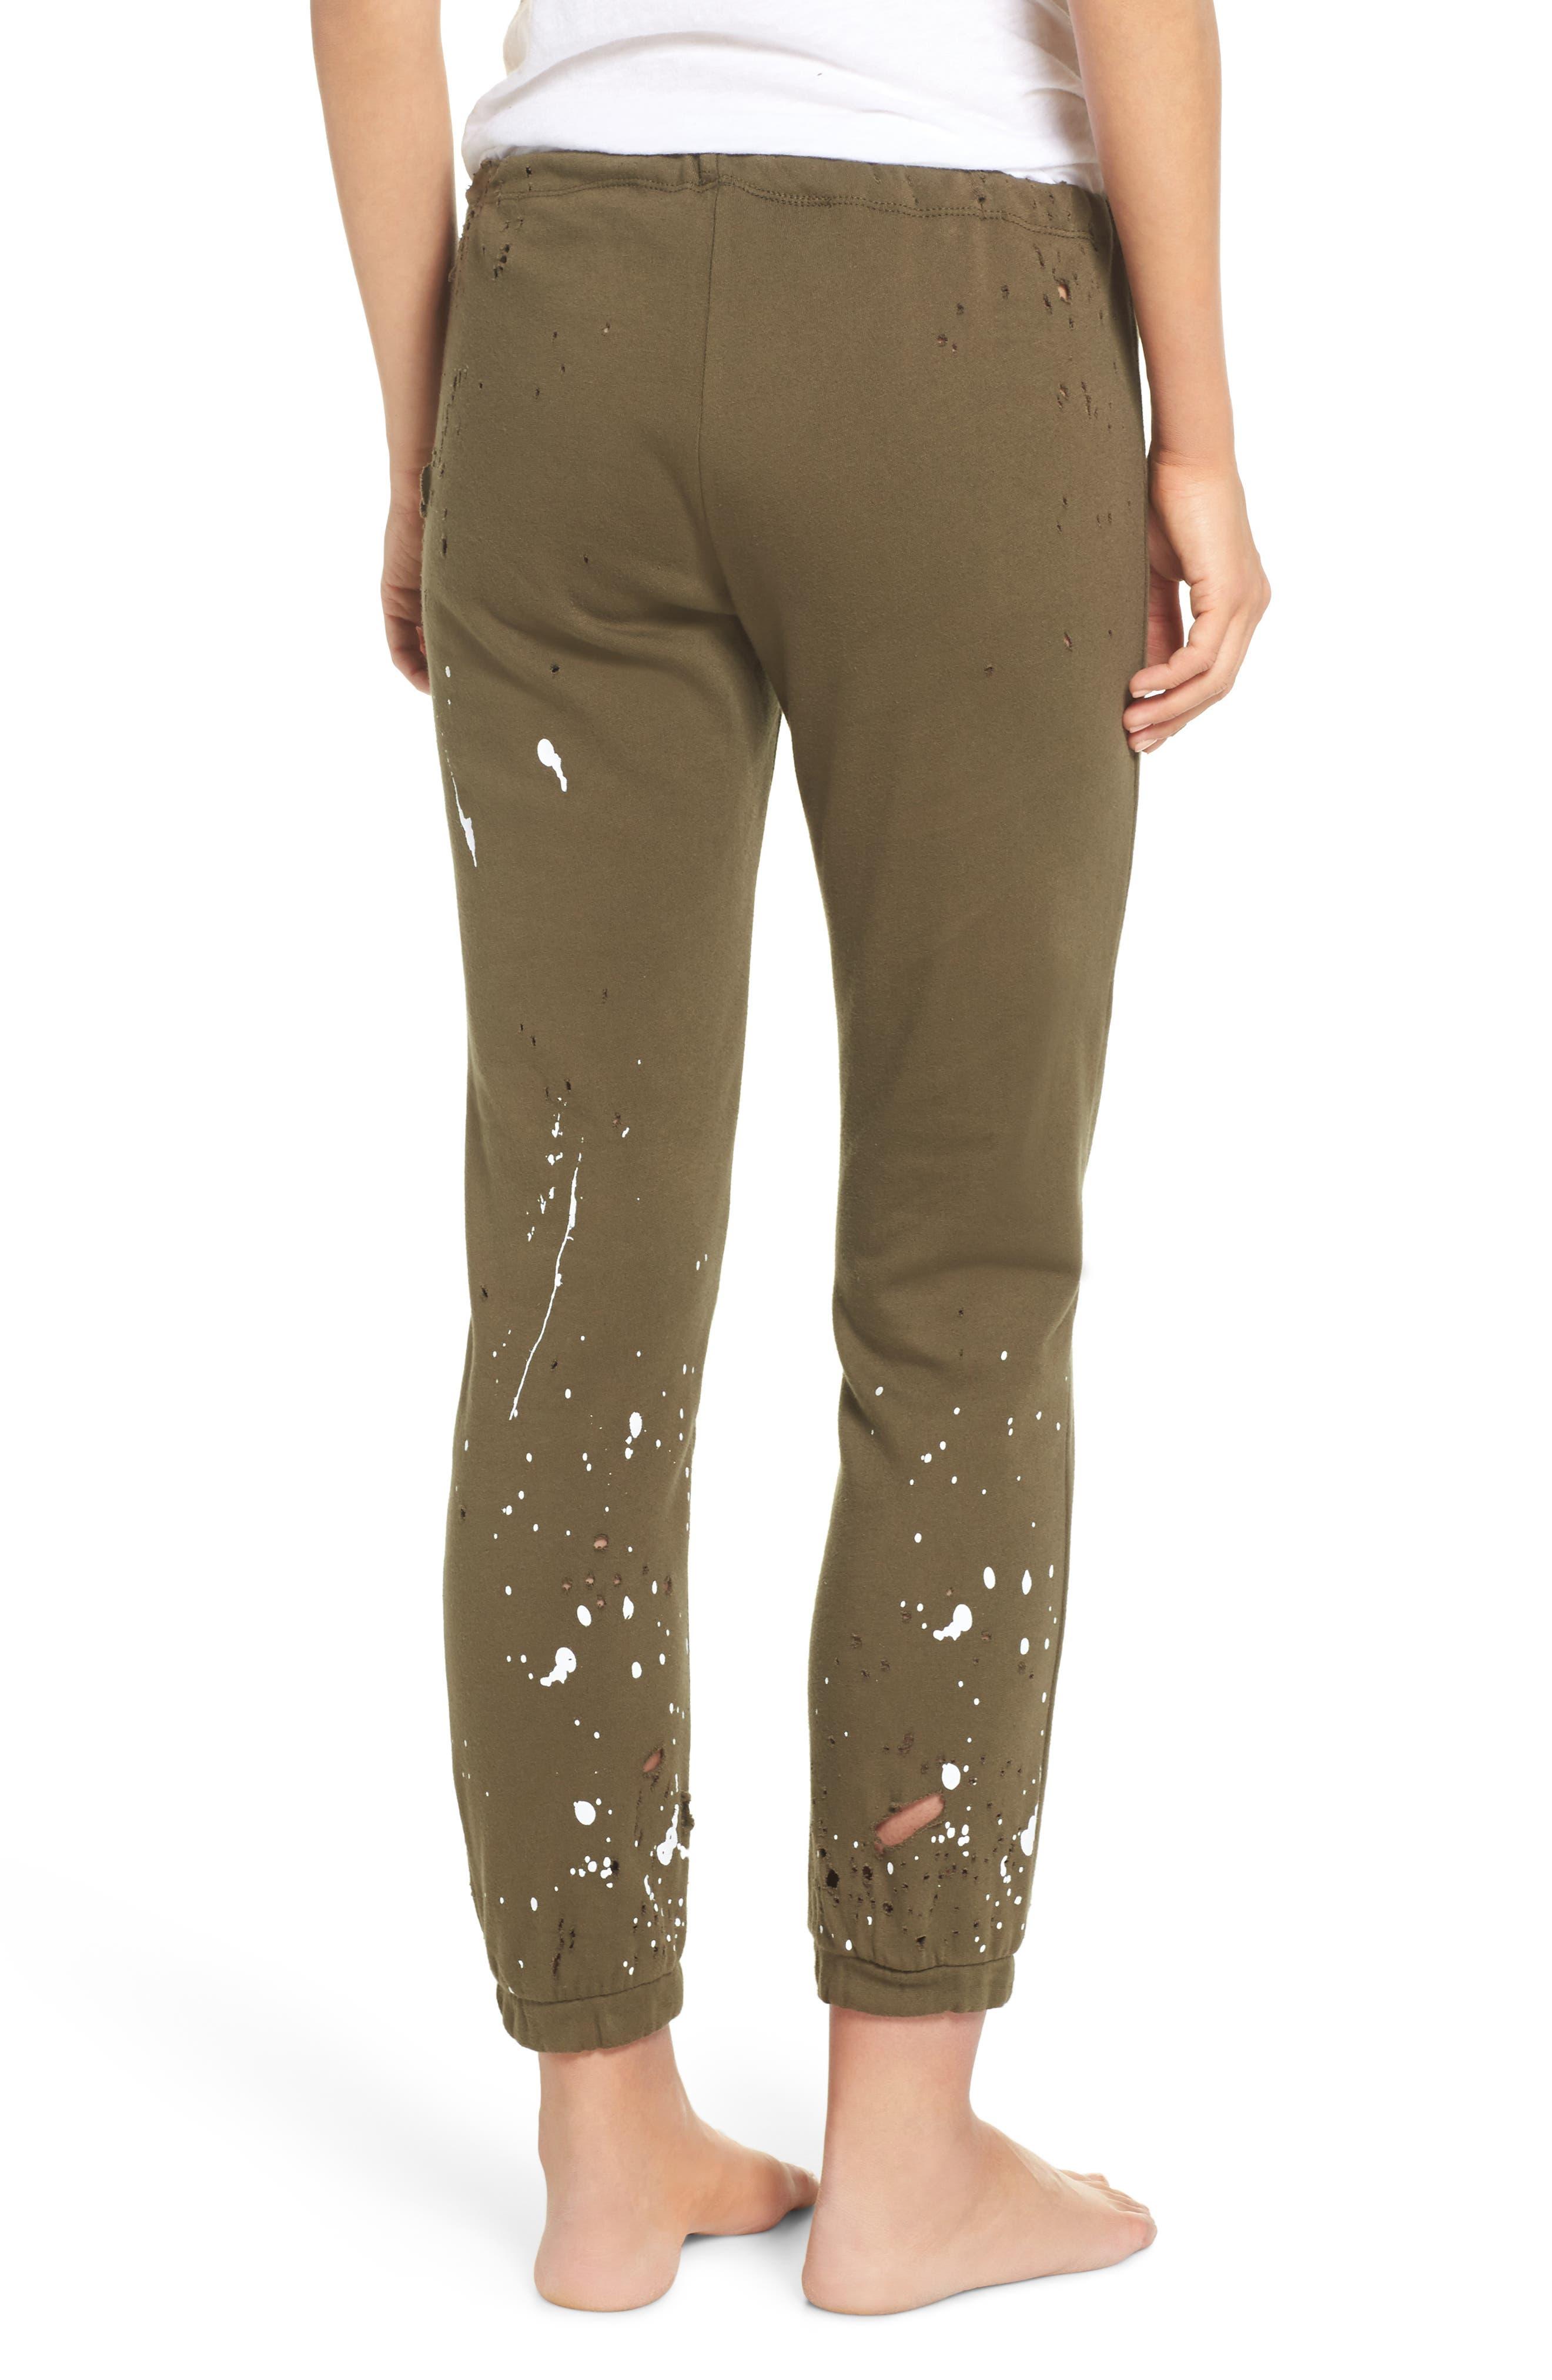 Distressed Fleece Jogger Lounge Pants,                             Alternate thumbnail 4, color,